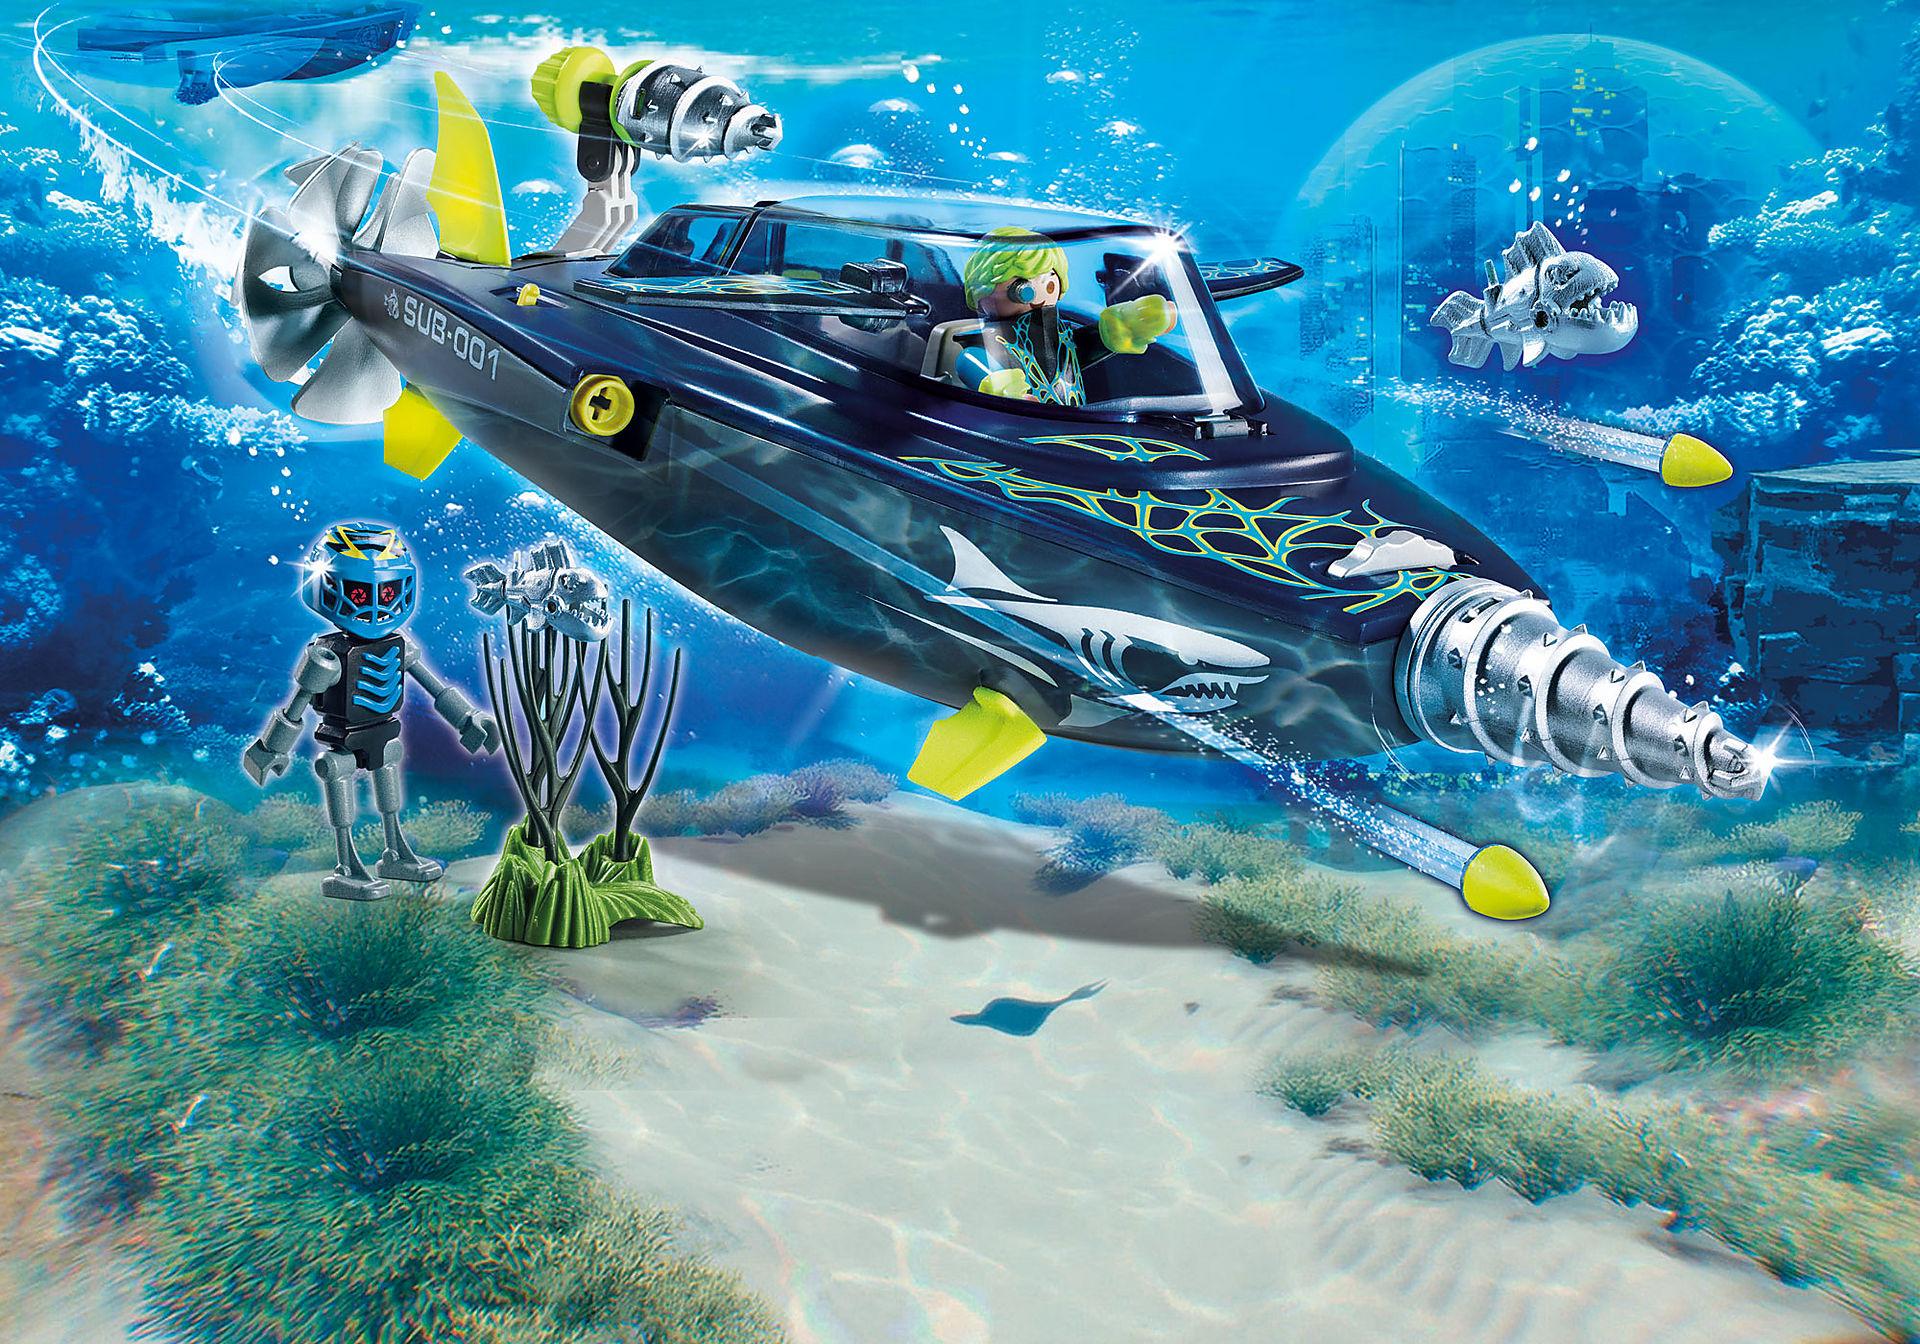 http://media.playmobil.com/i/playmobil/70005_product_detail/Sottomarino da assalto del Team S.H.A.R.K.